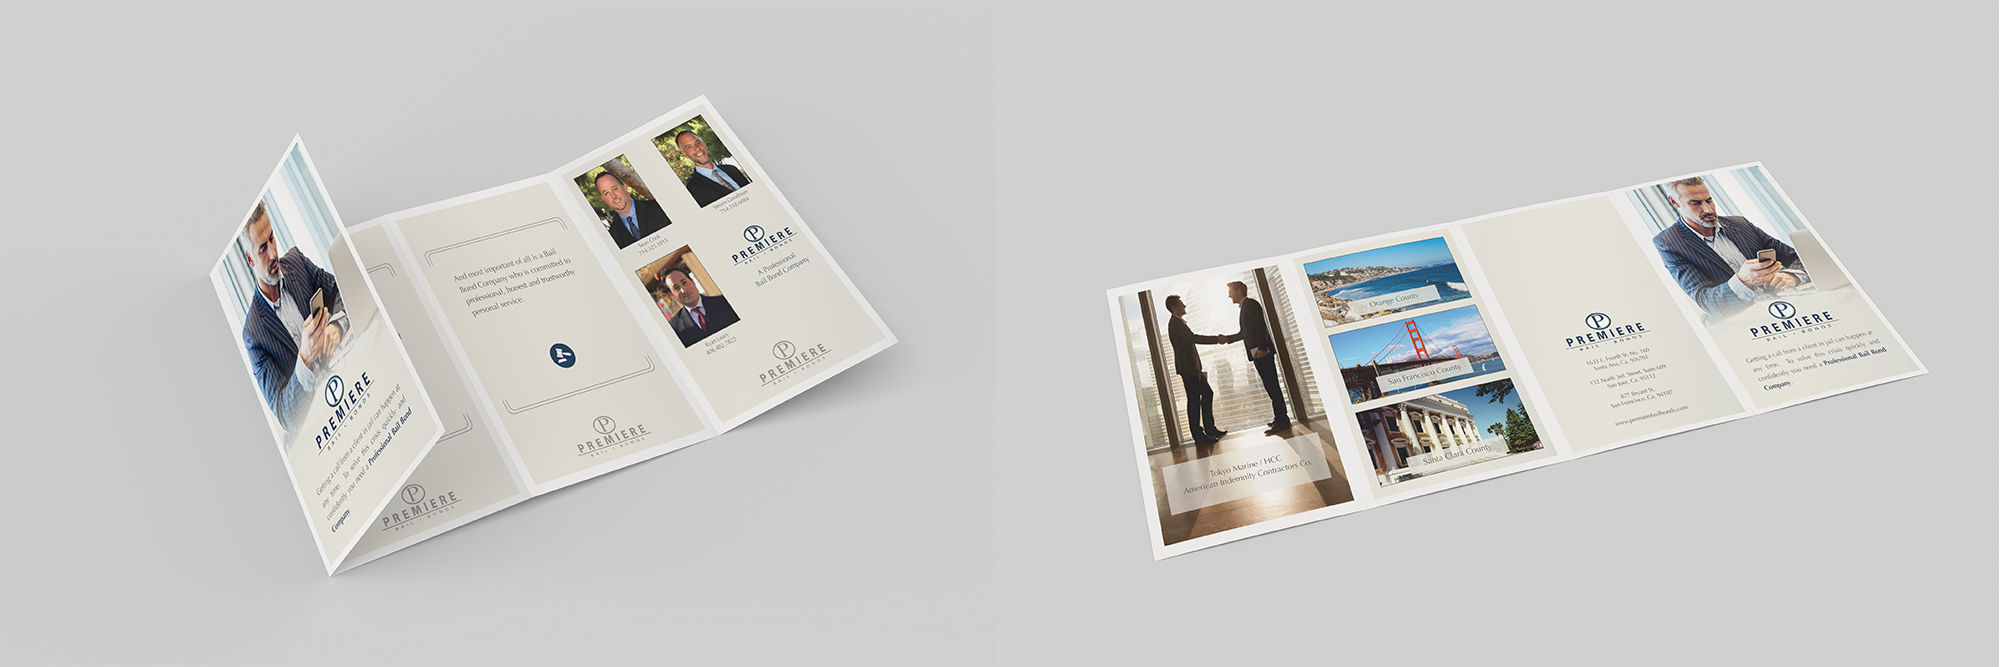 Premiere-4-panel-brochure